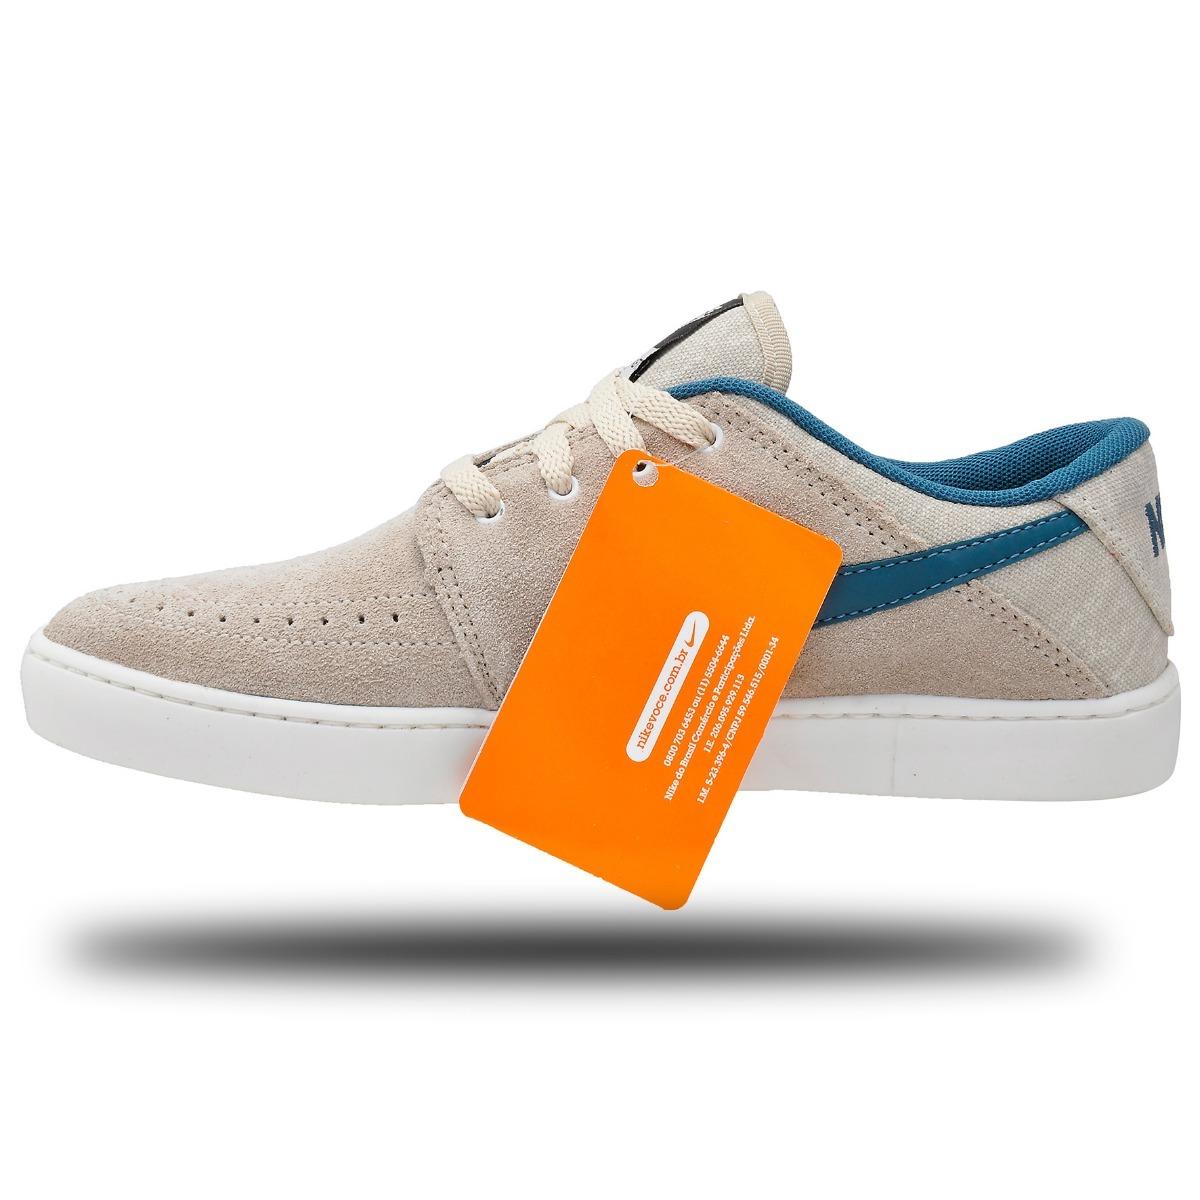 to buy outlet on sale new high promo code for nike suketo femmes orange eac3c d1368